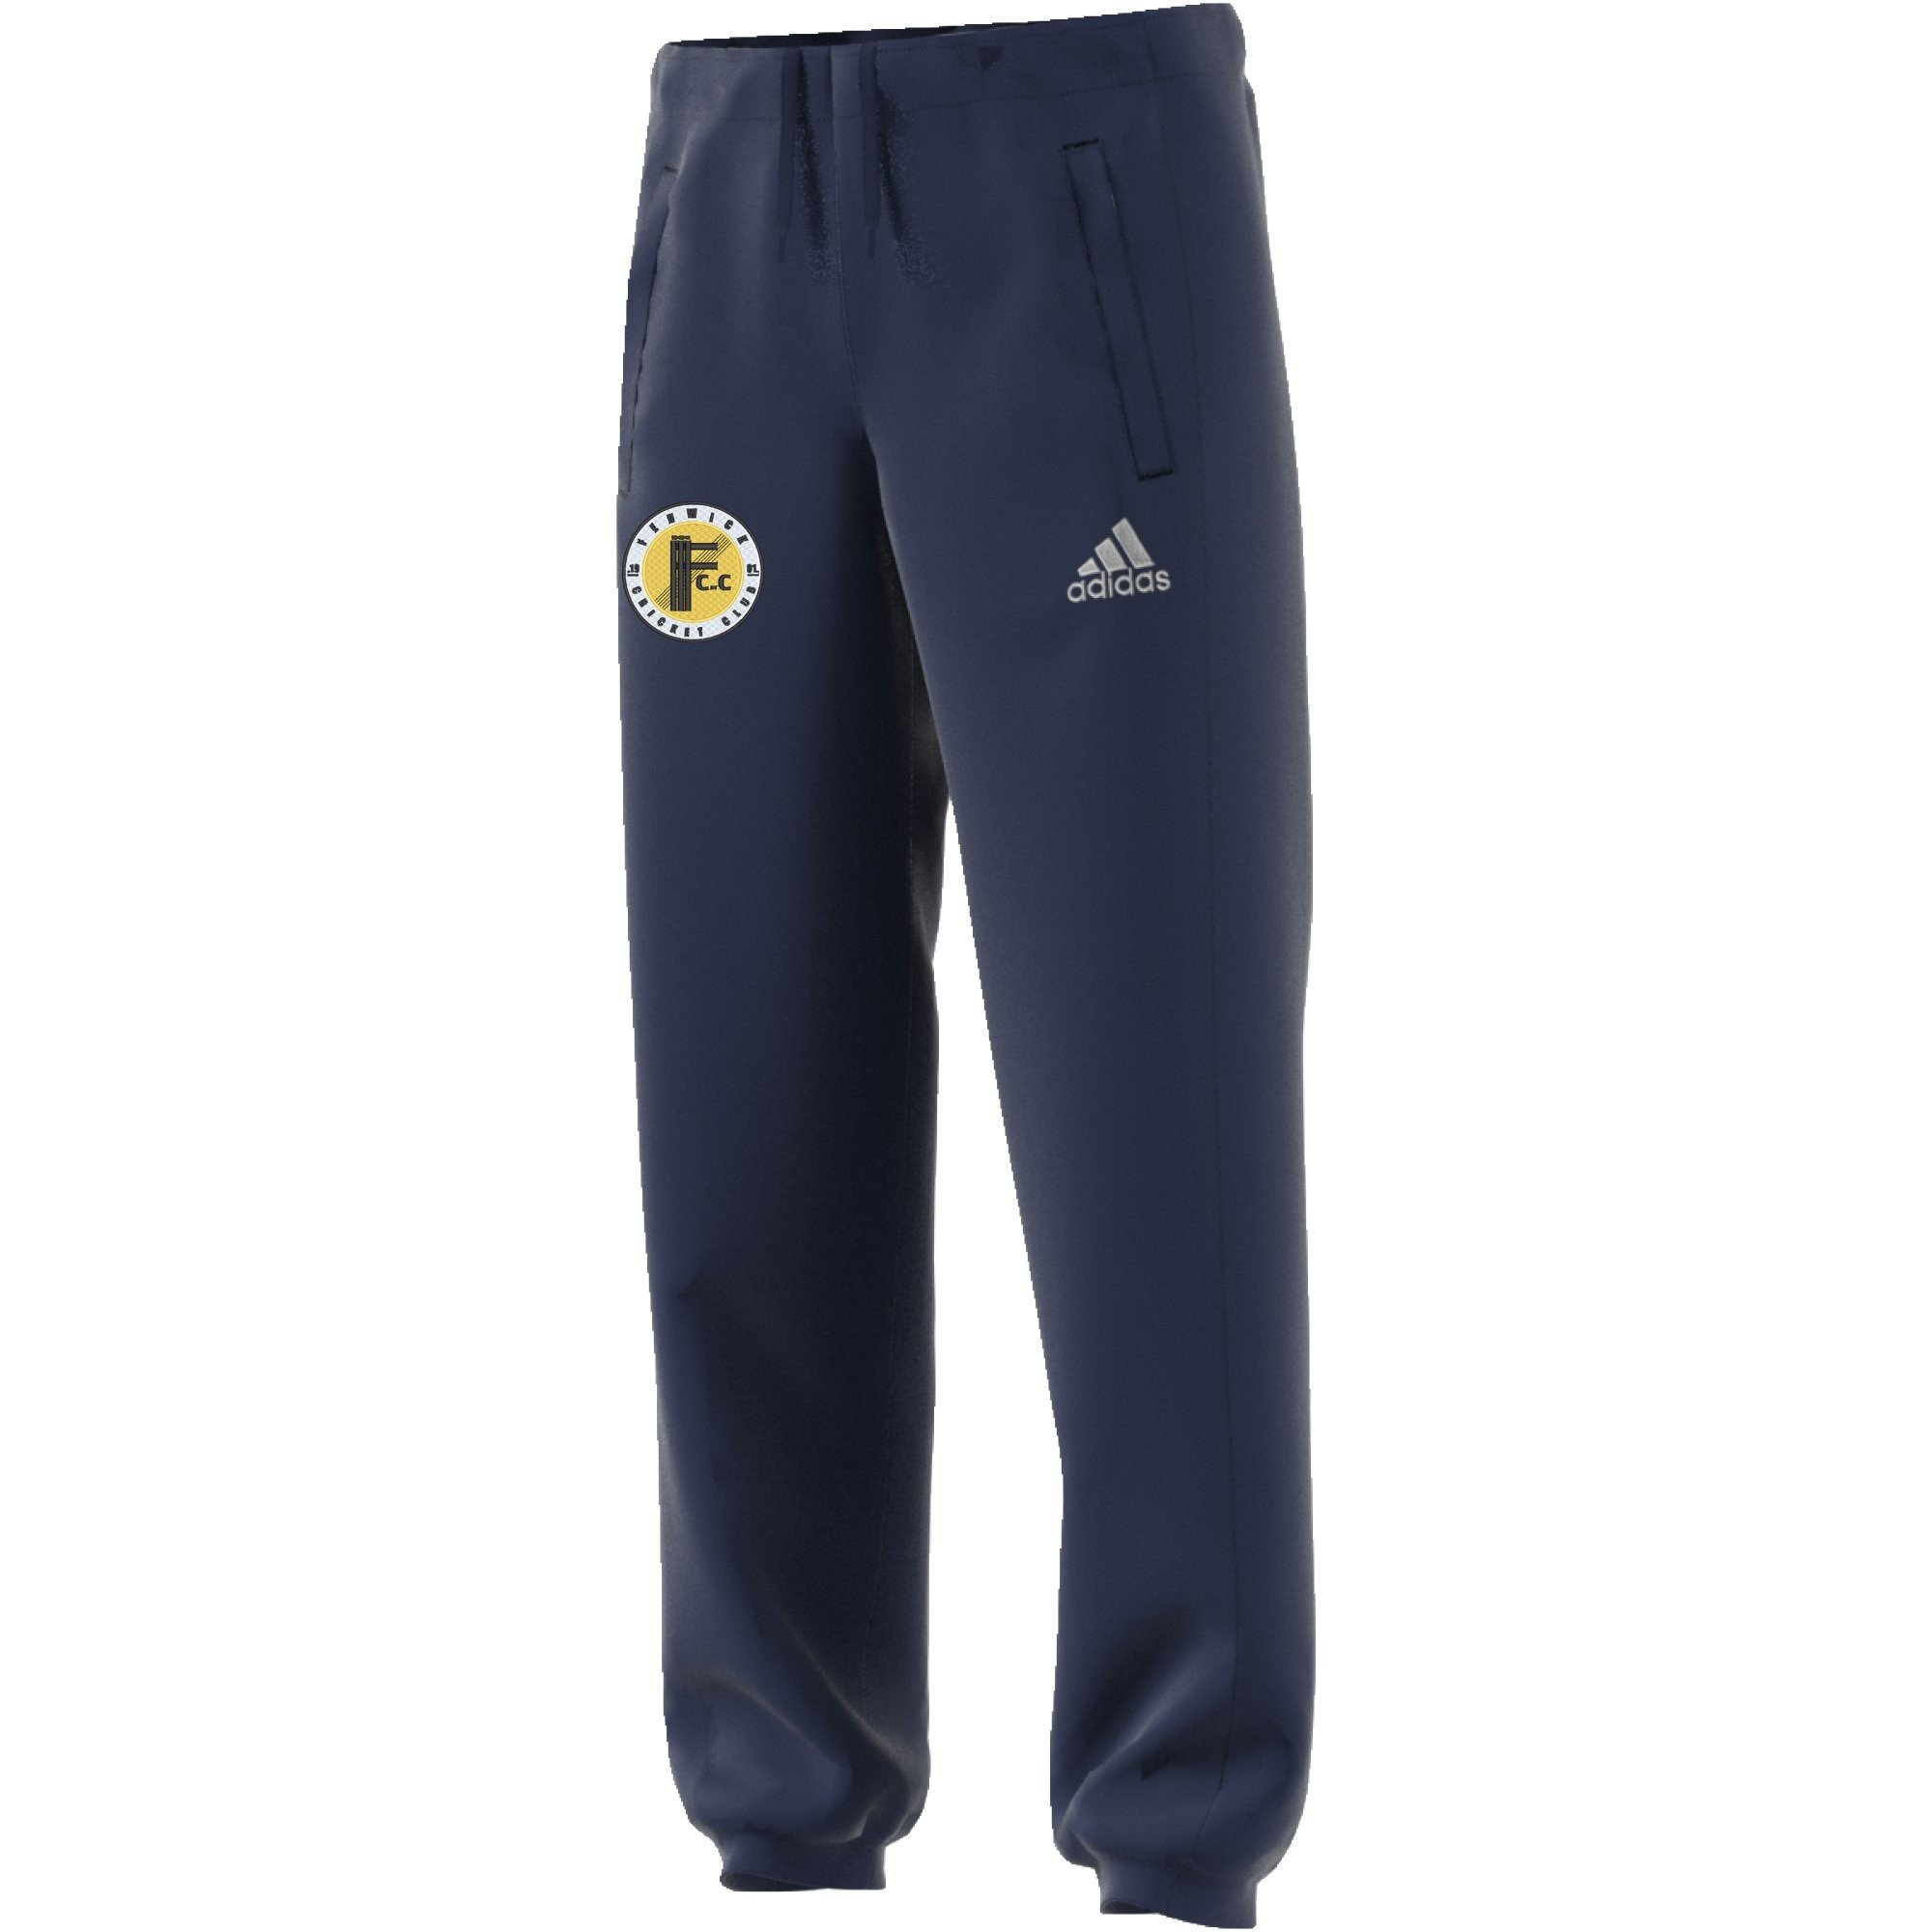 Fenwick CC Adidas Navy Sweat Pants